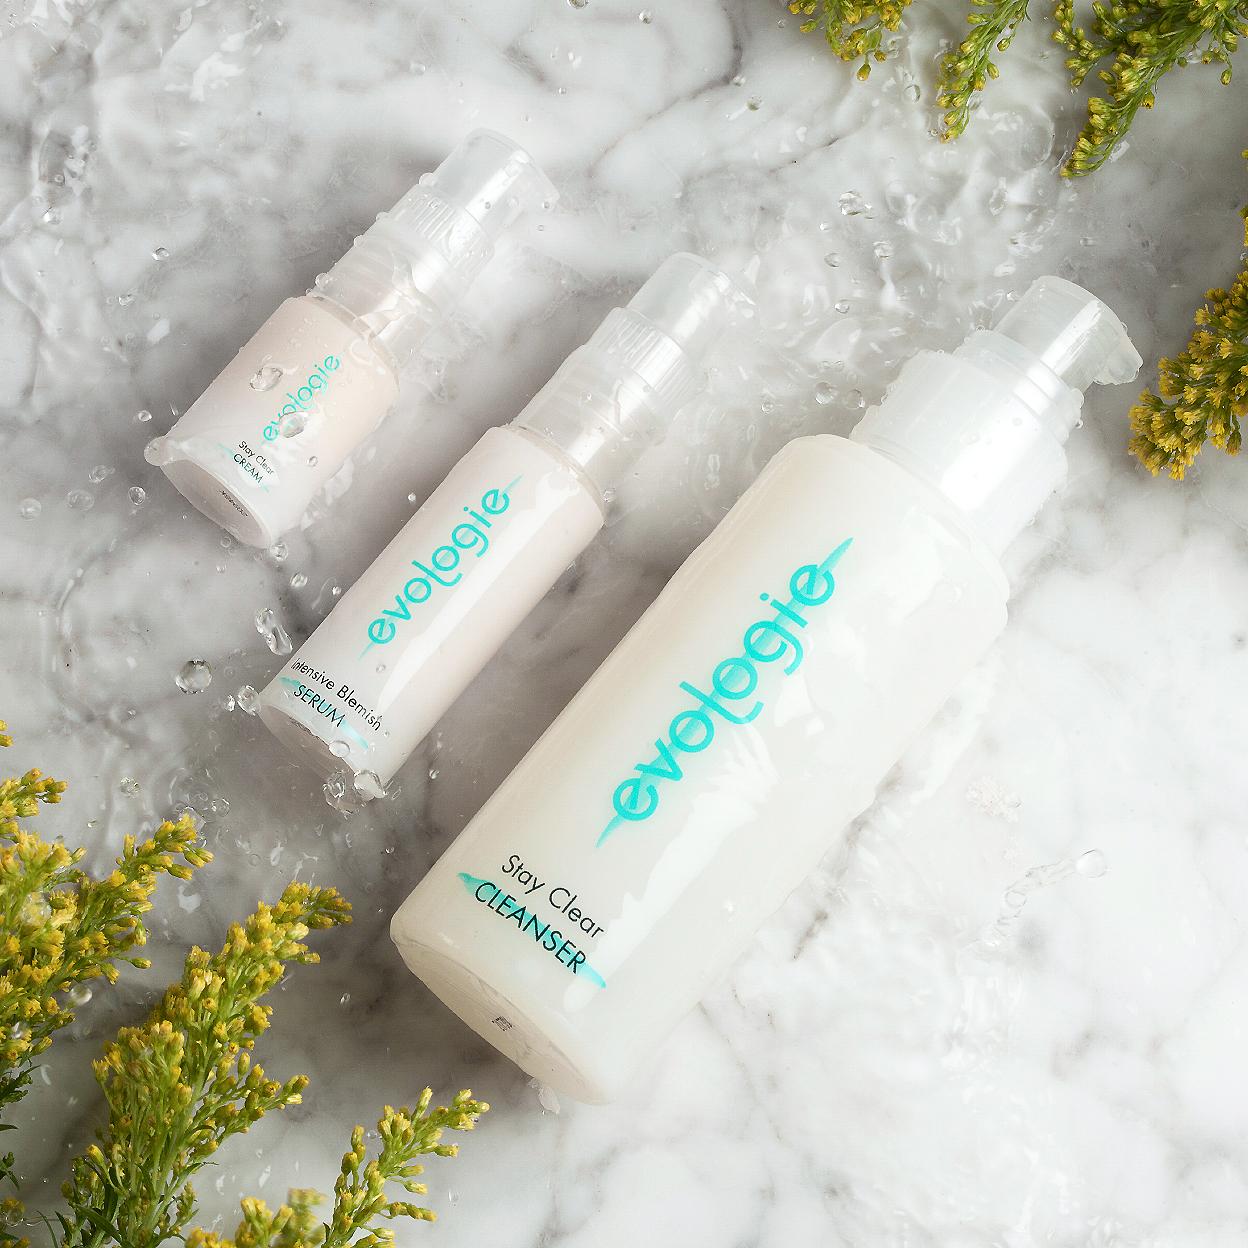 Evologie – Clear Skin Kit #Giveaway